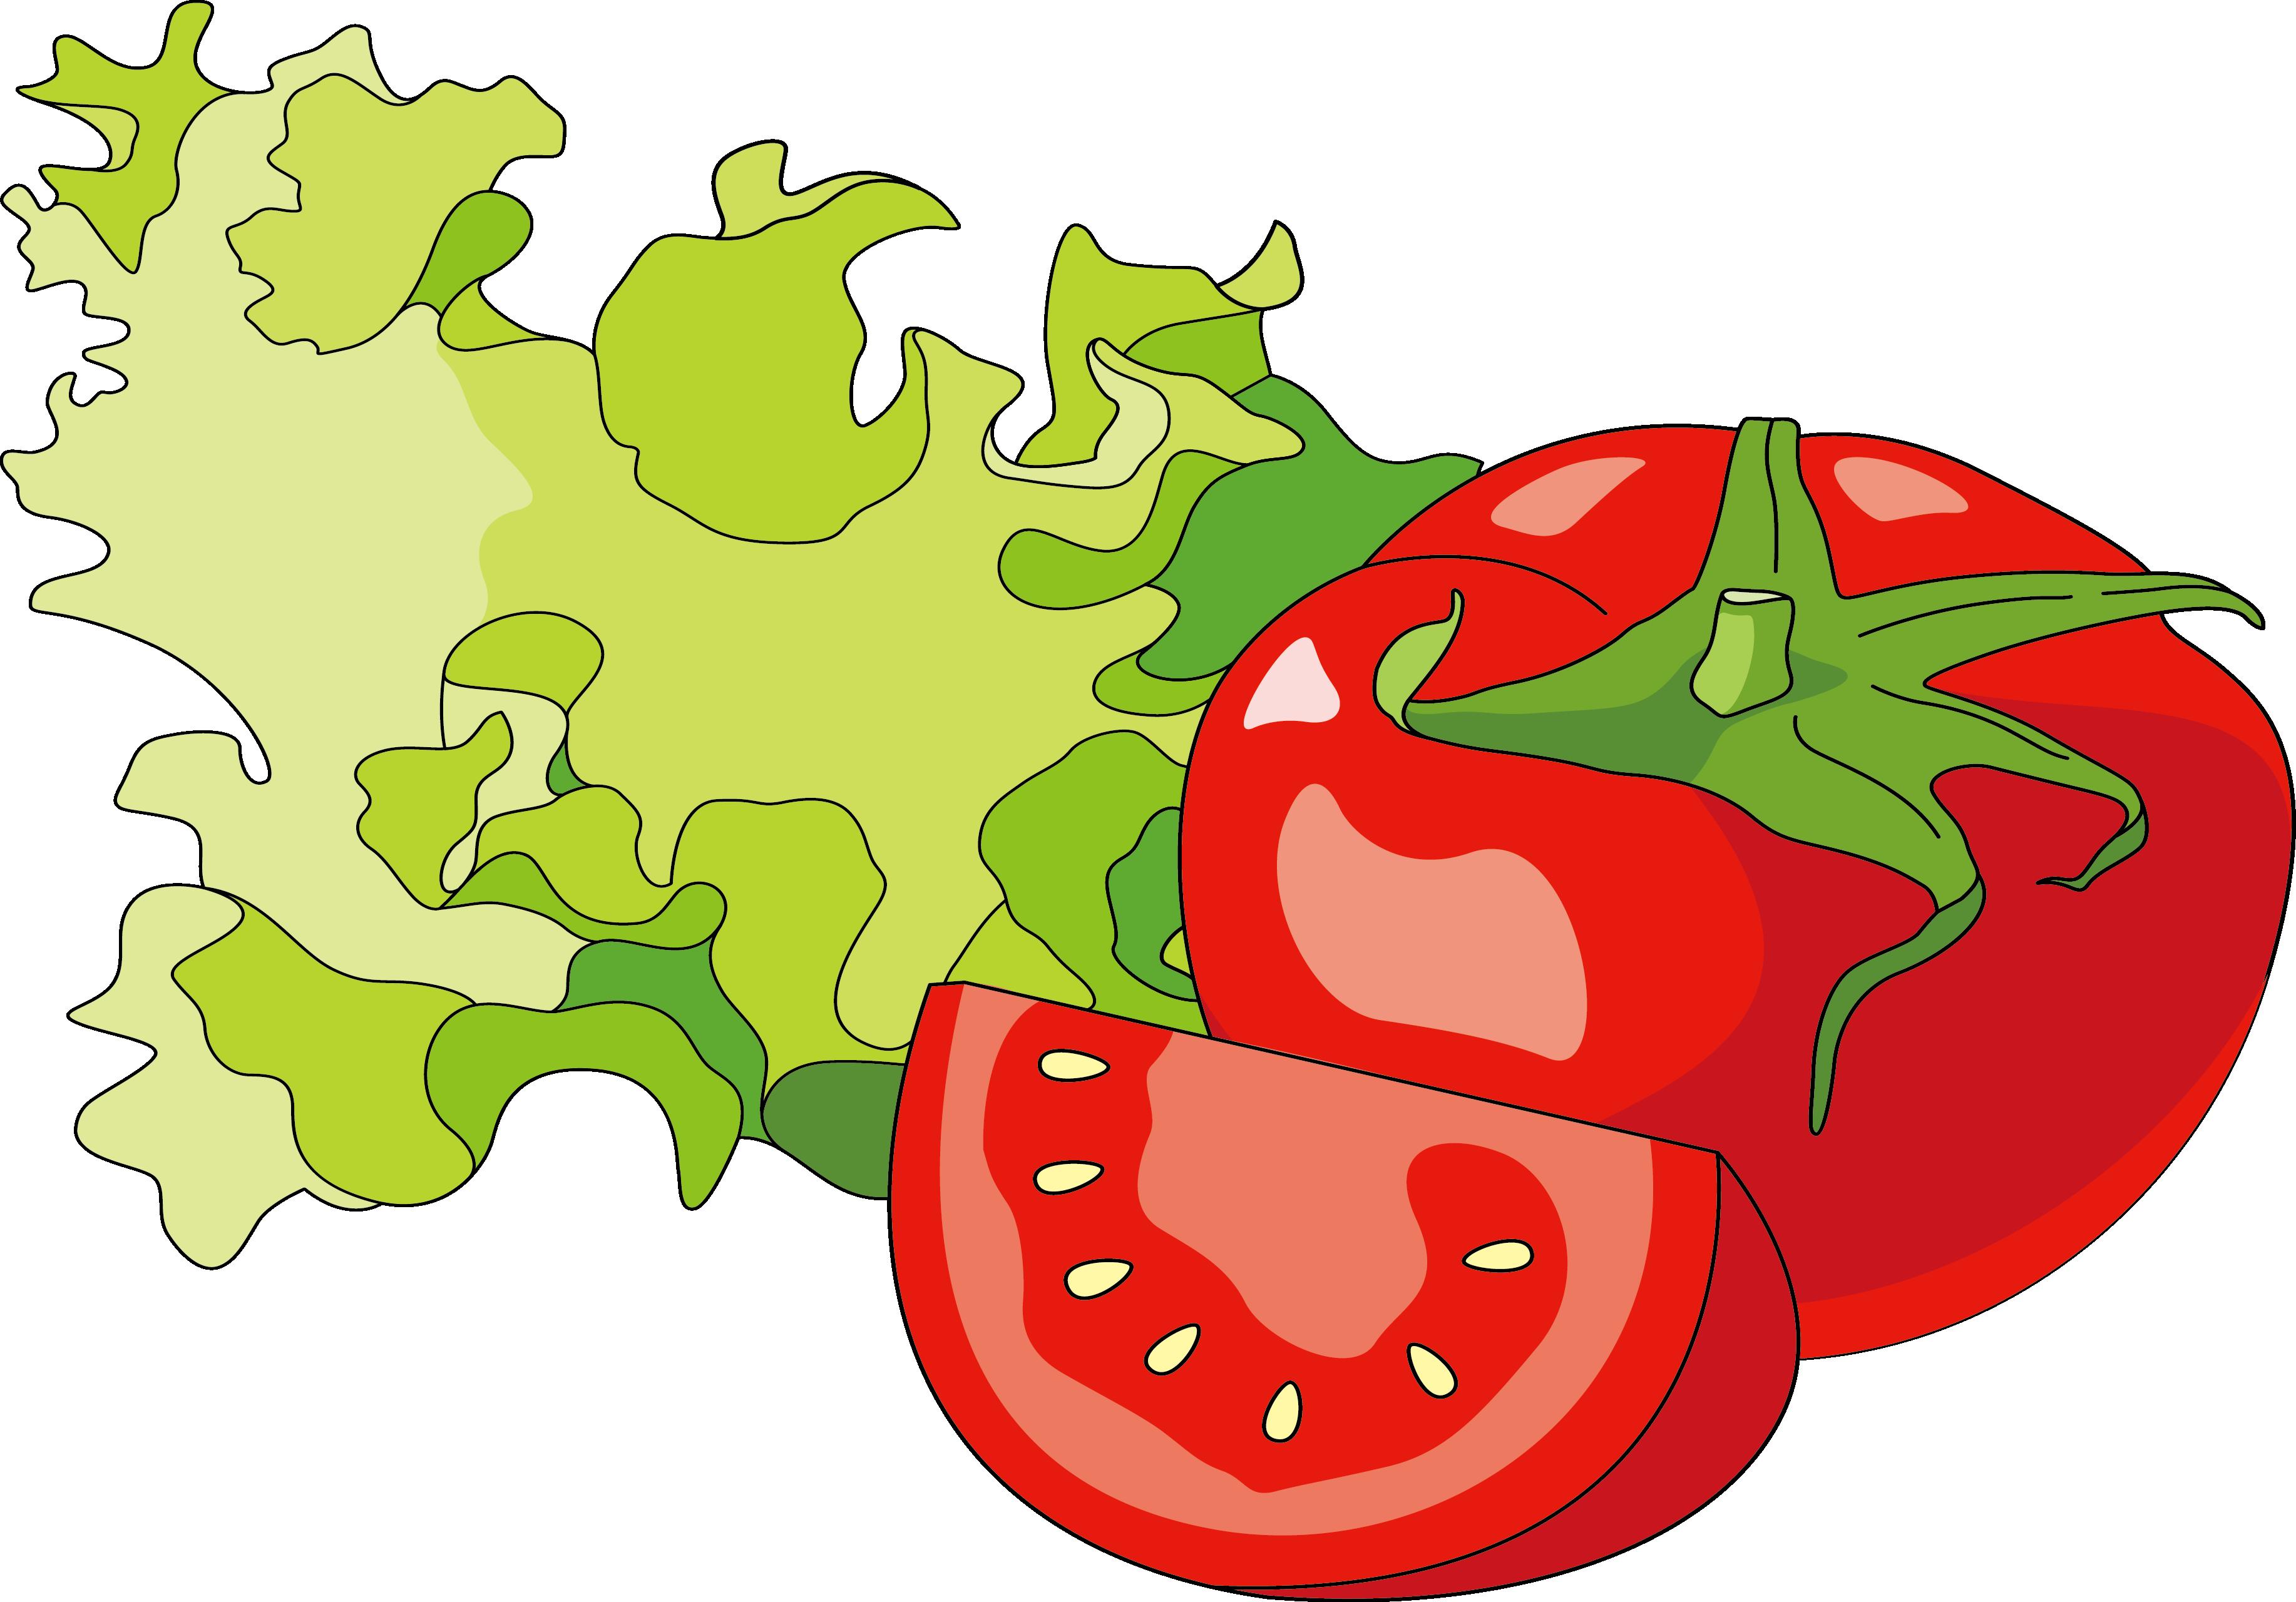 3668x2560 Hot Dog Hamburger Tomato Illustration